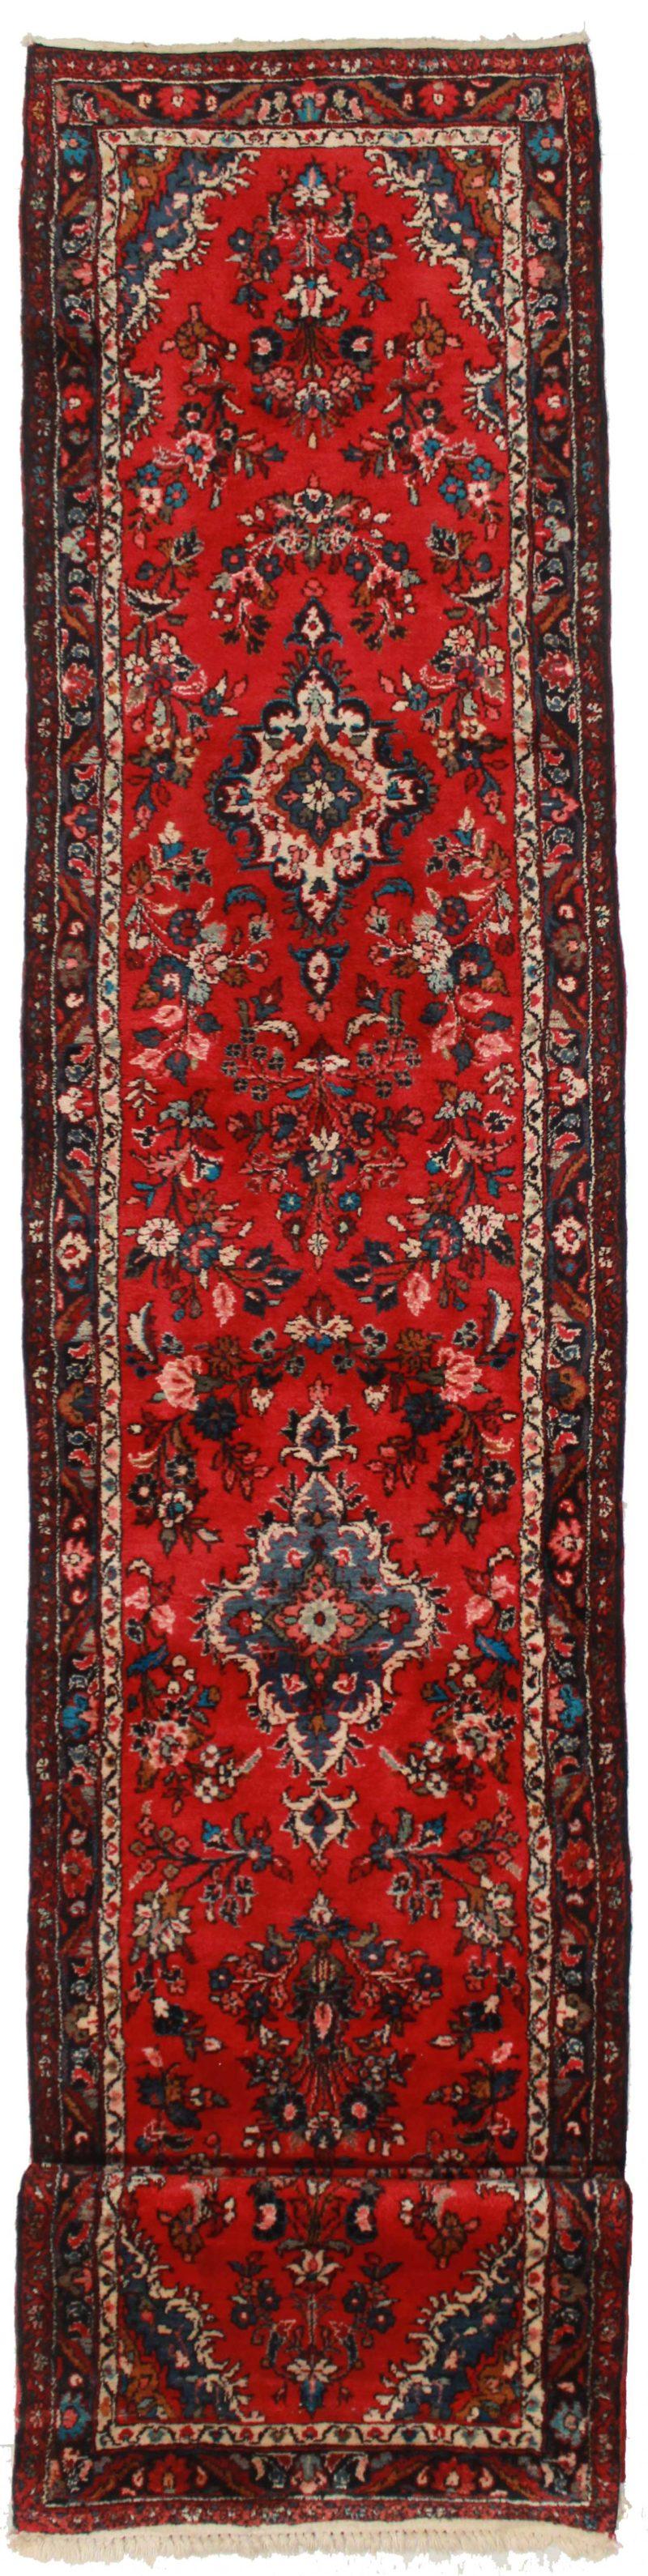 3 x 25 Vintage Persian Hamadan Runner 14200